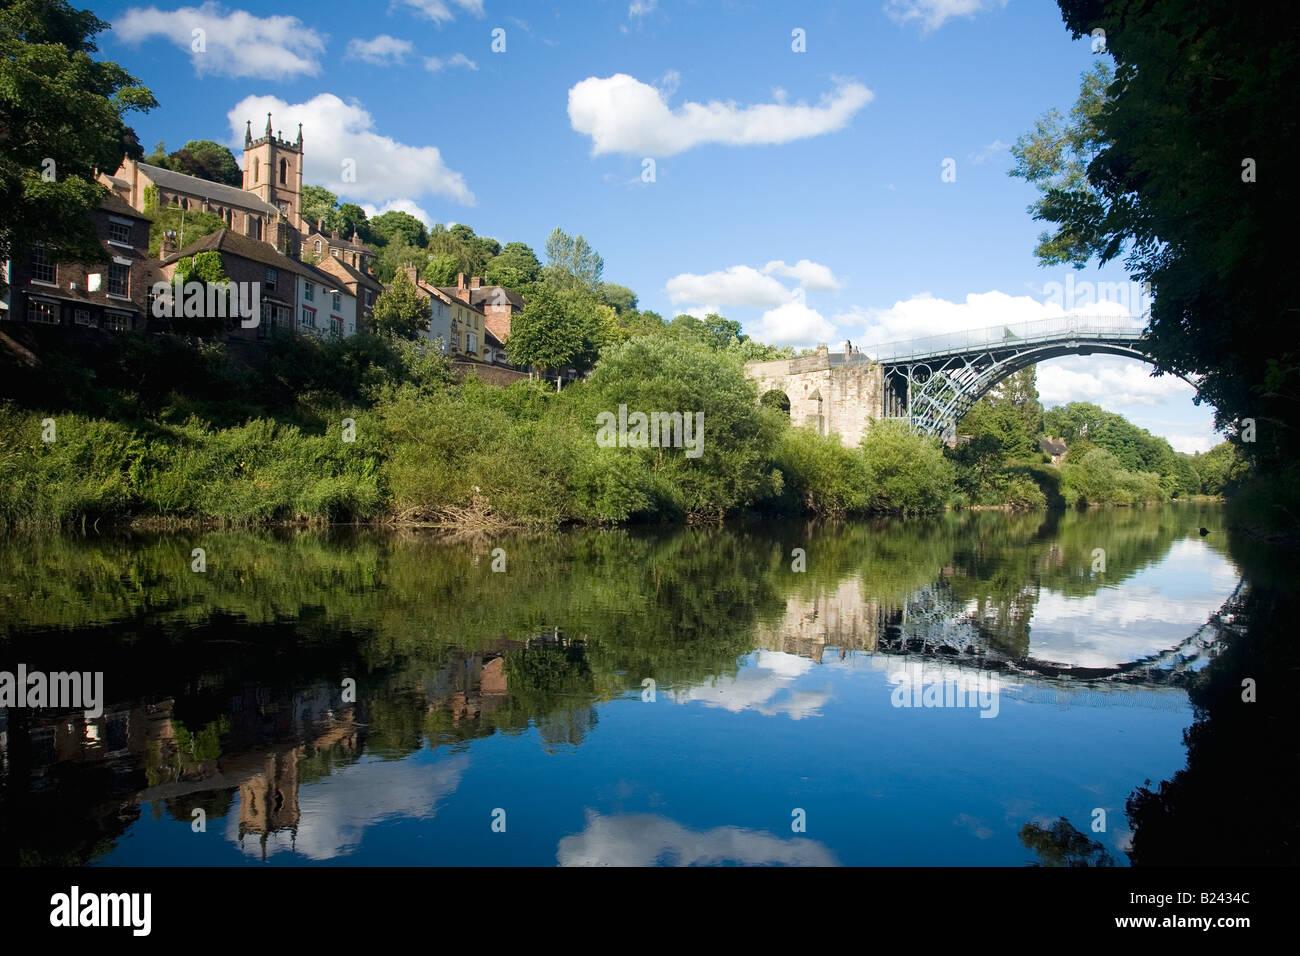 Ironbridge village world's first iron bridge spanning banks of River Severn in late evening summer light Ironbridge - Stock Image